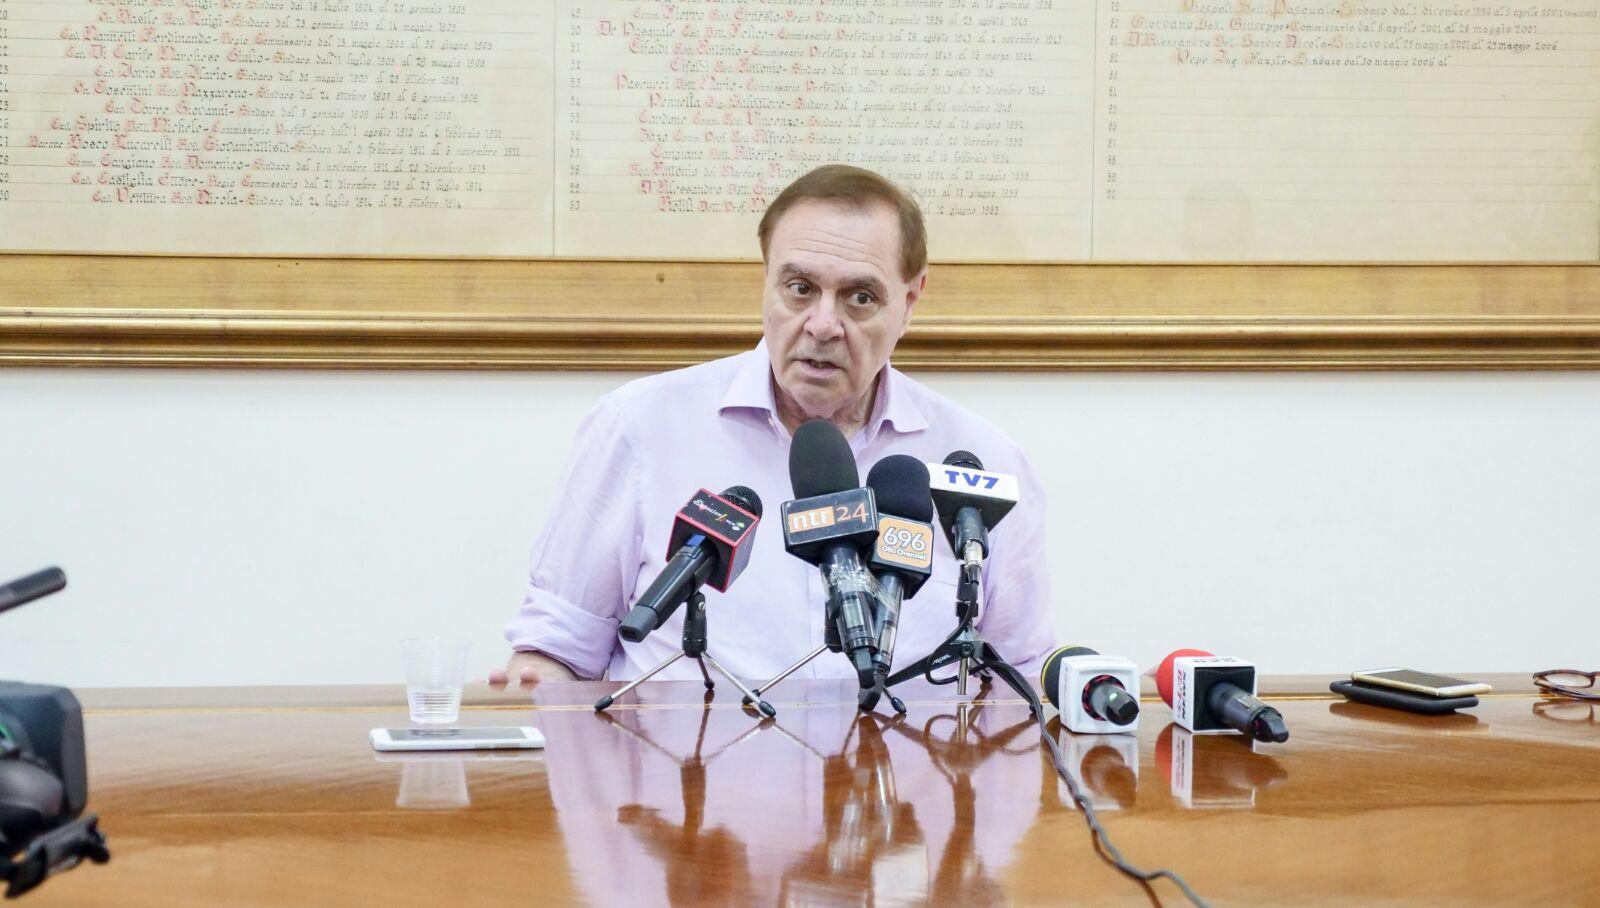 Processo Udeur, c'e' la sentenza: assolto Clemente Mastella